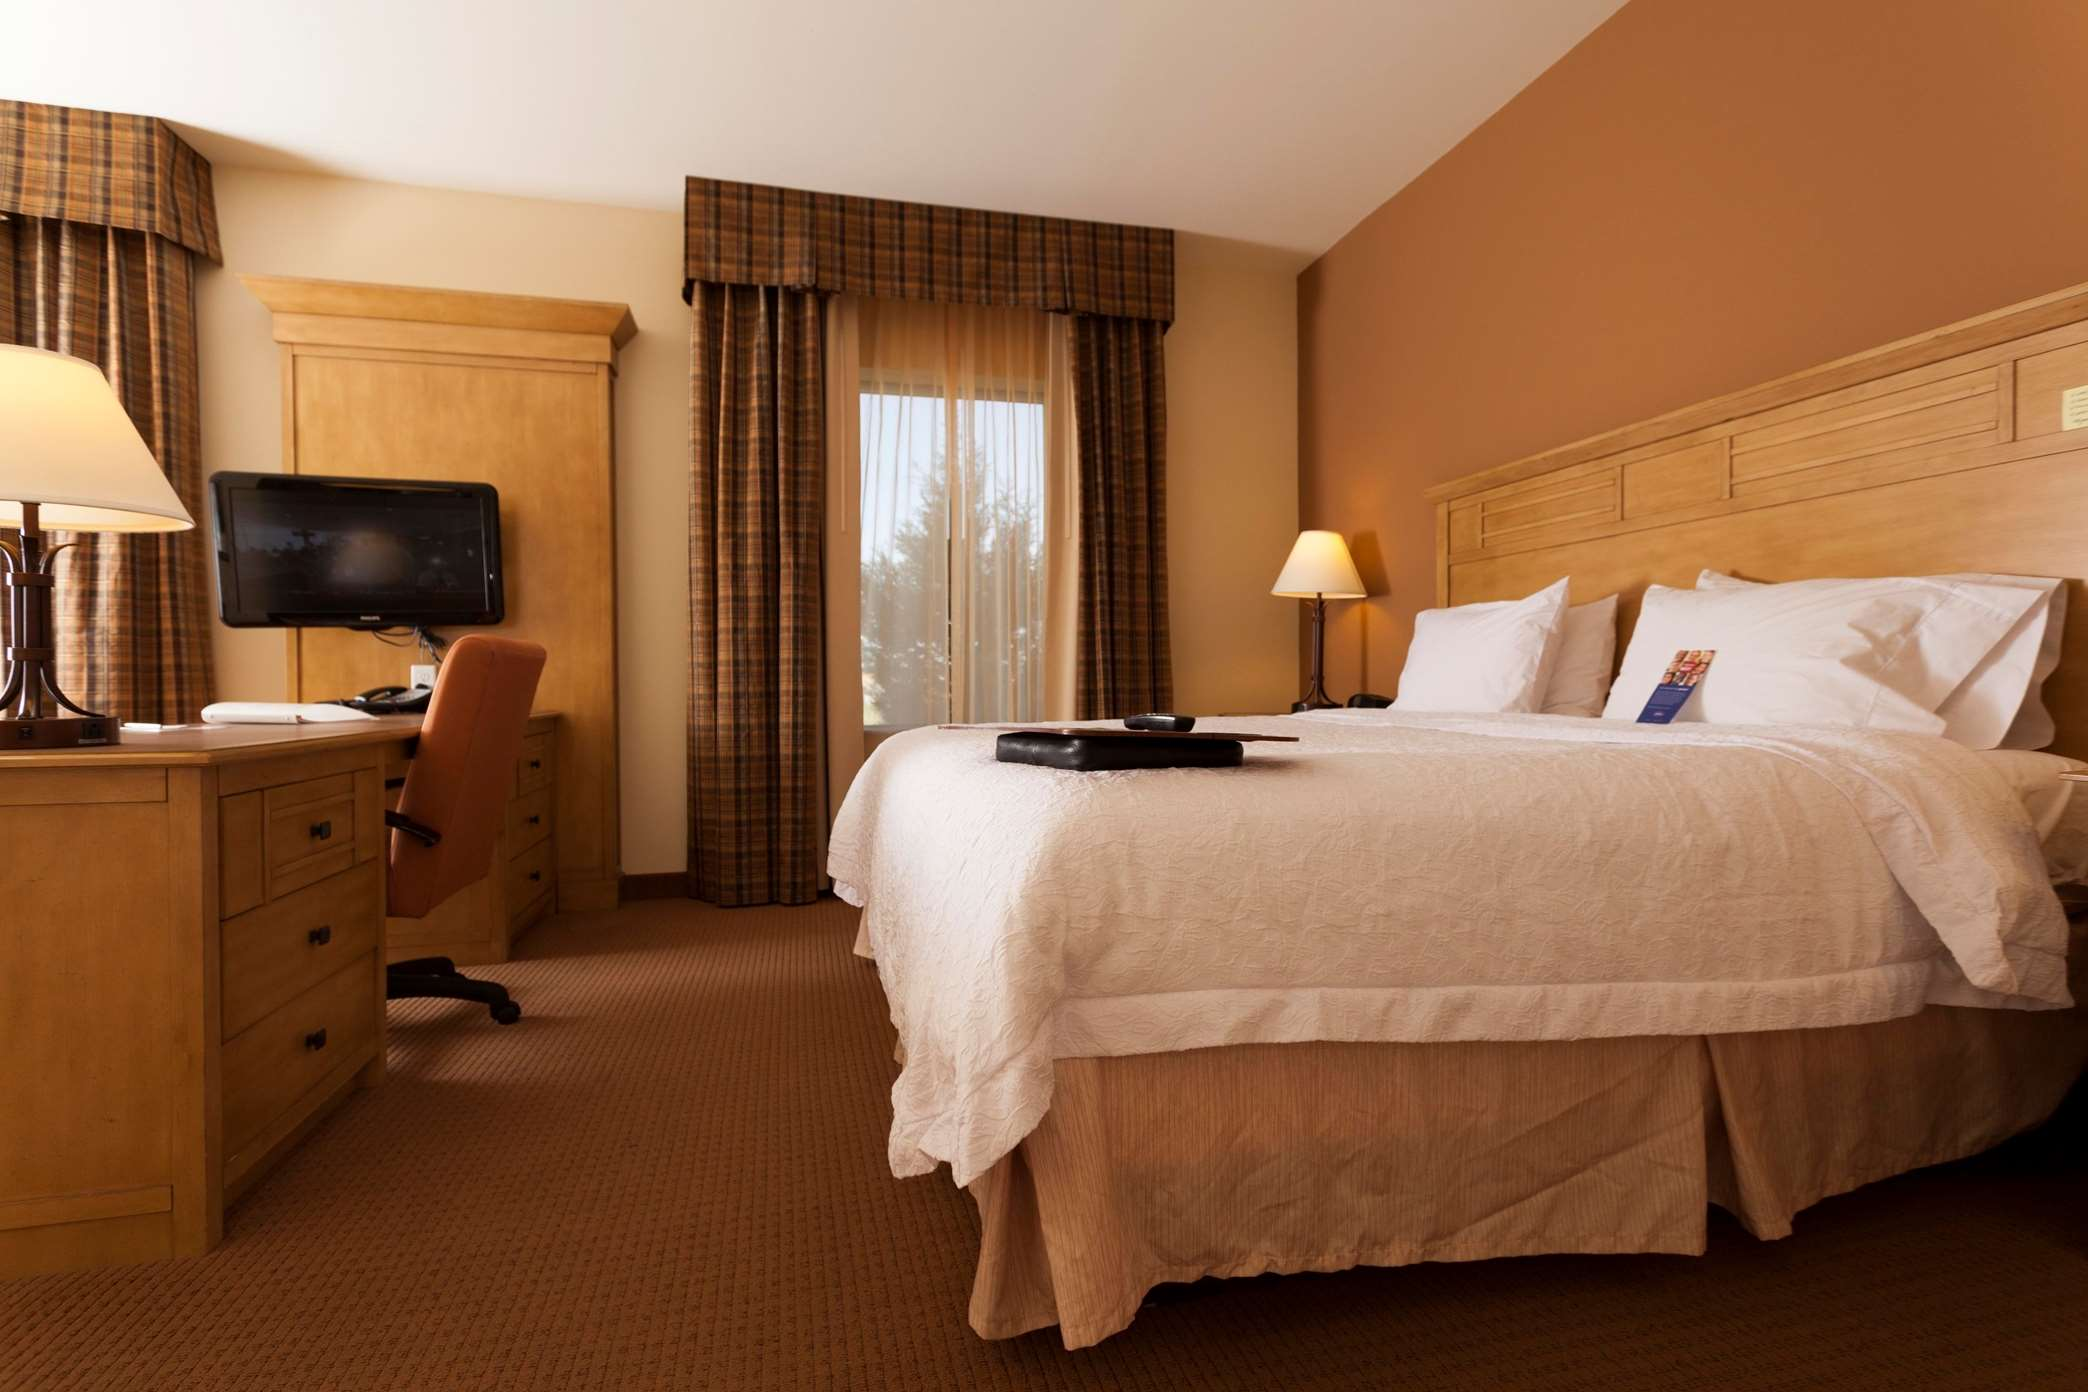 Hampton Inn & Suites Riverton image 15